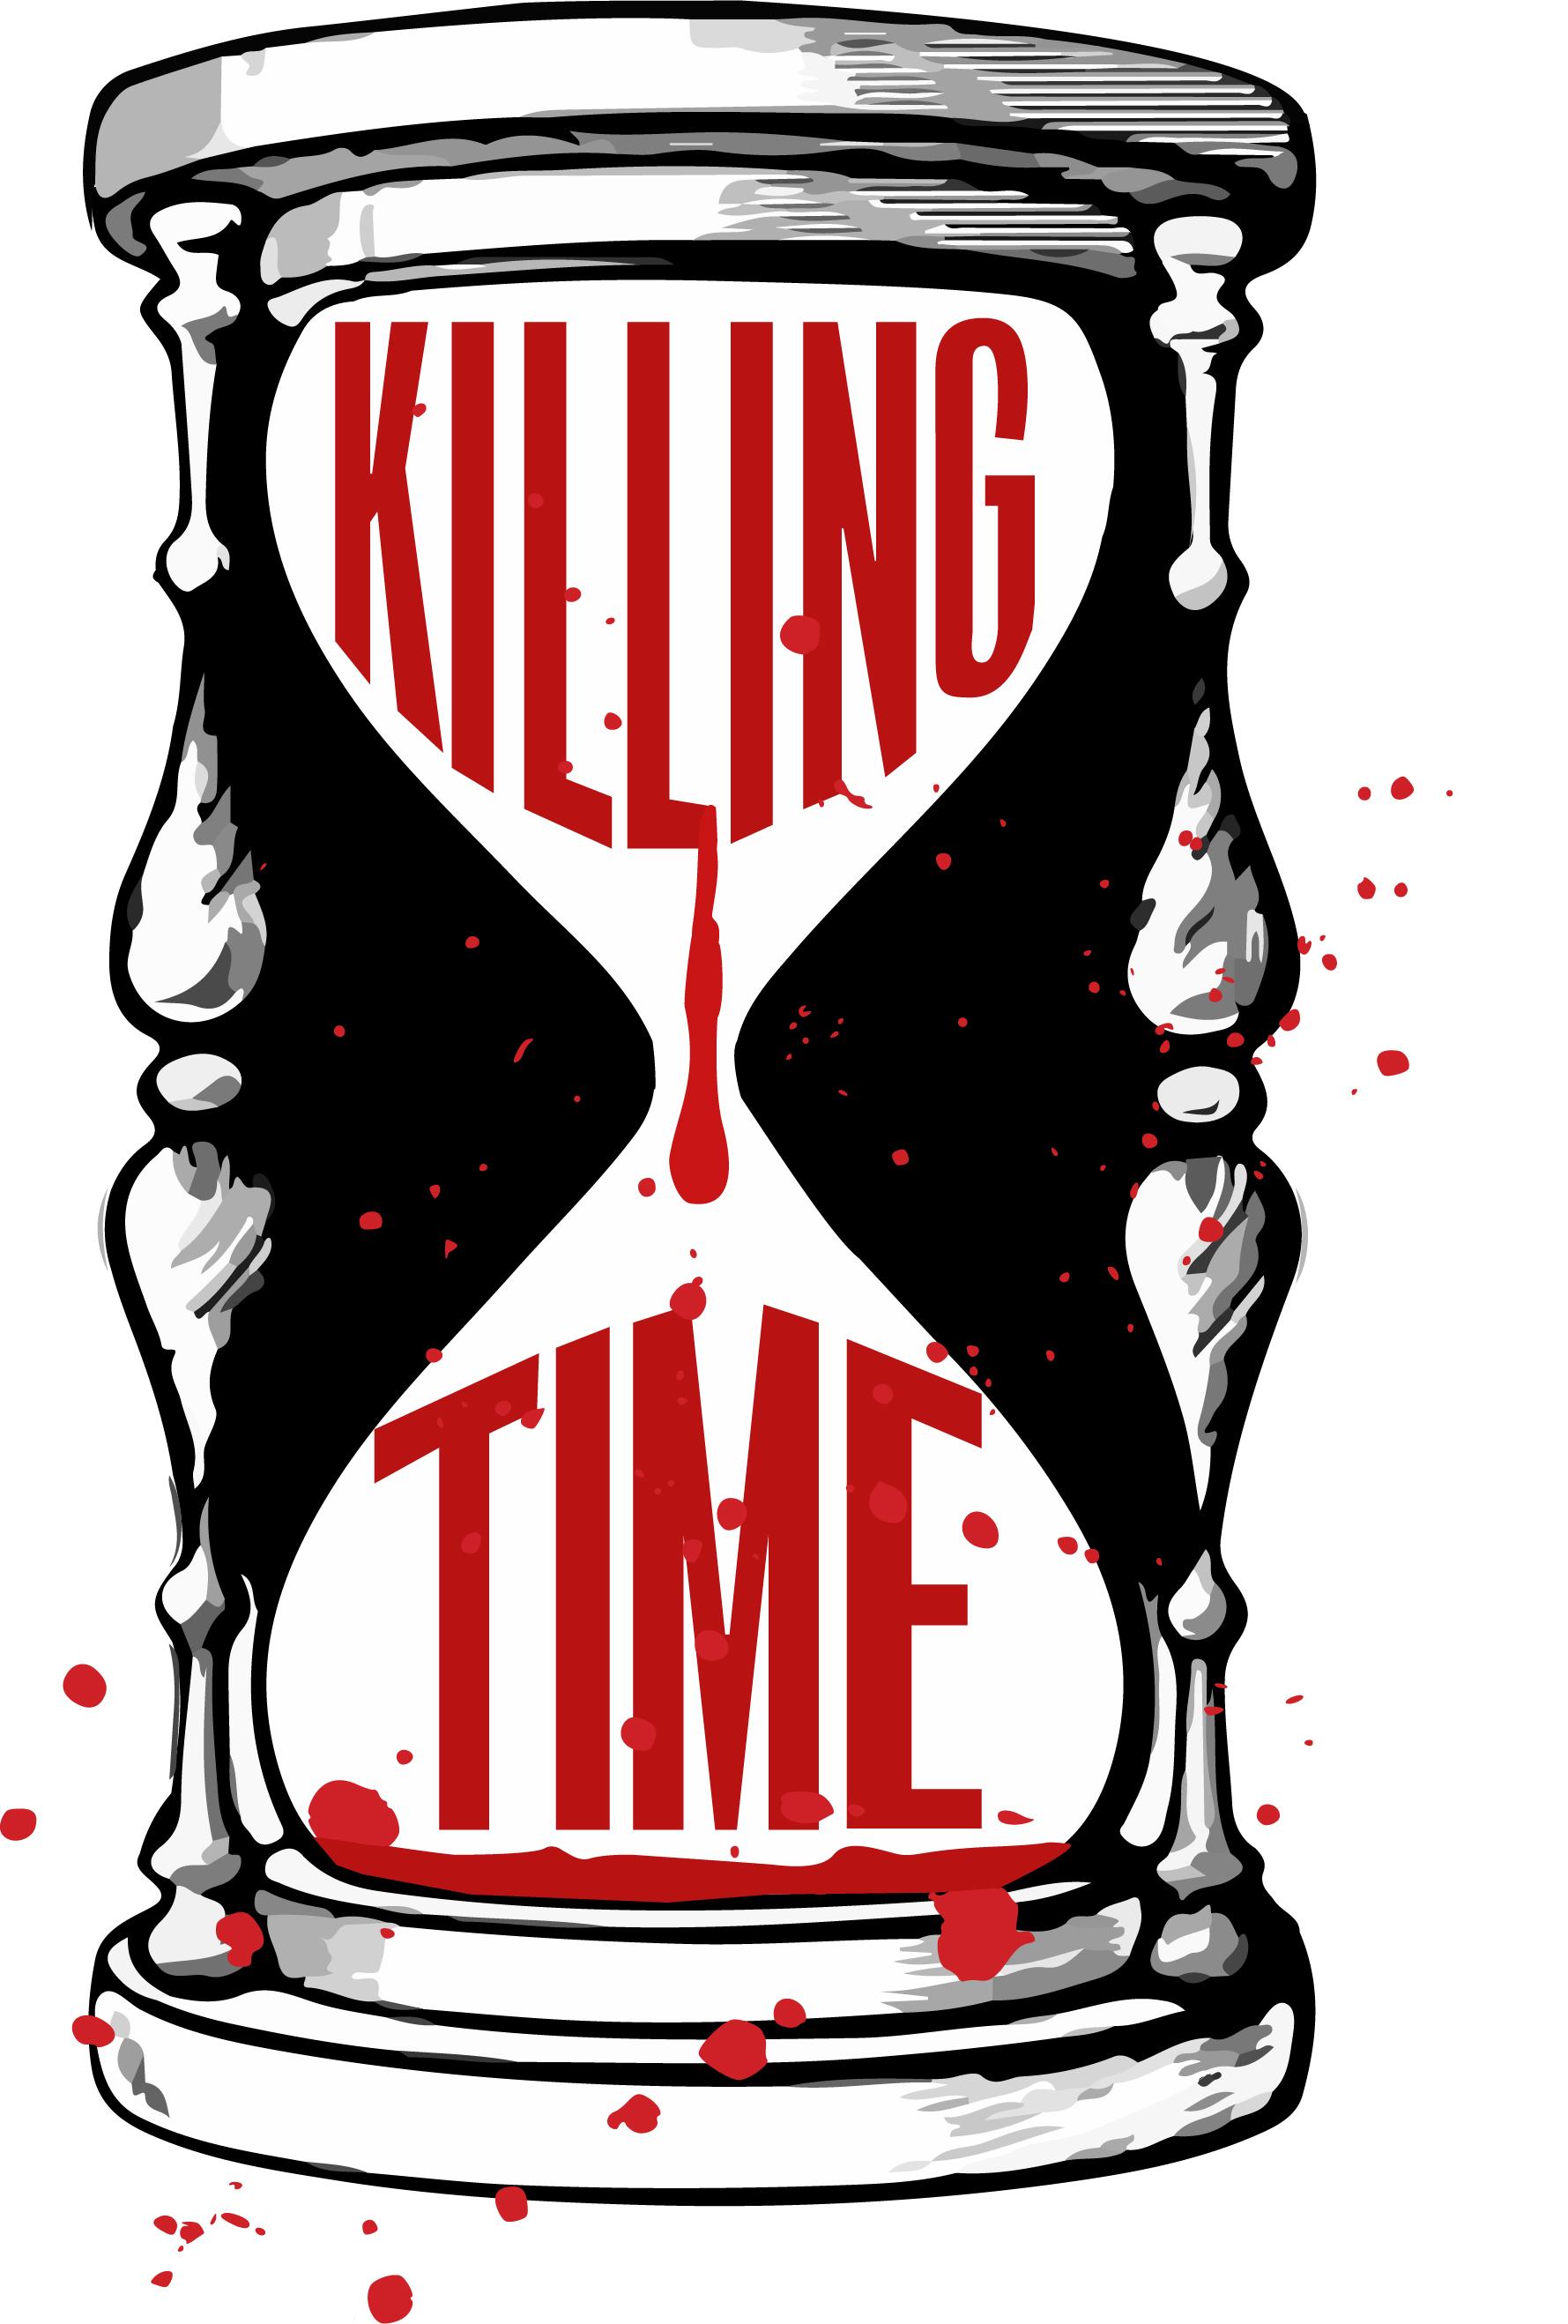 10th Annual Murder Mystery Weekend